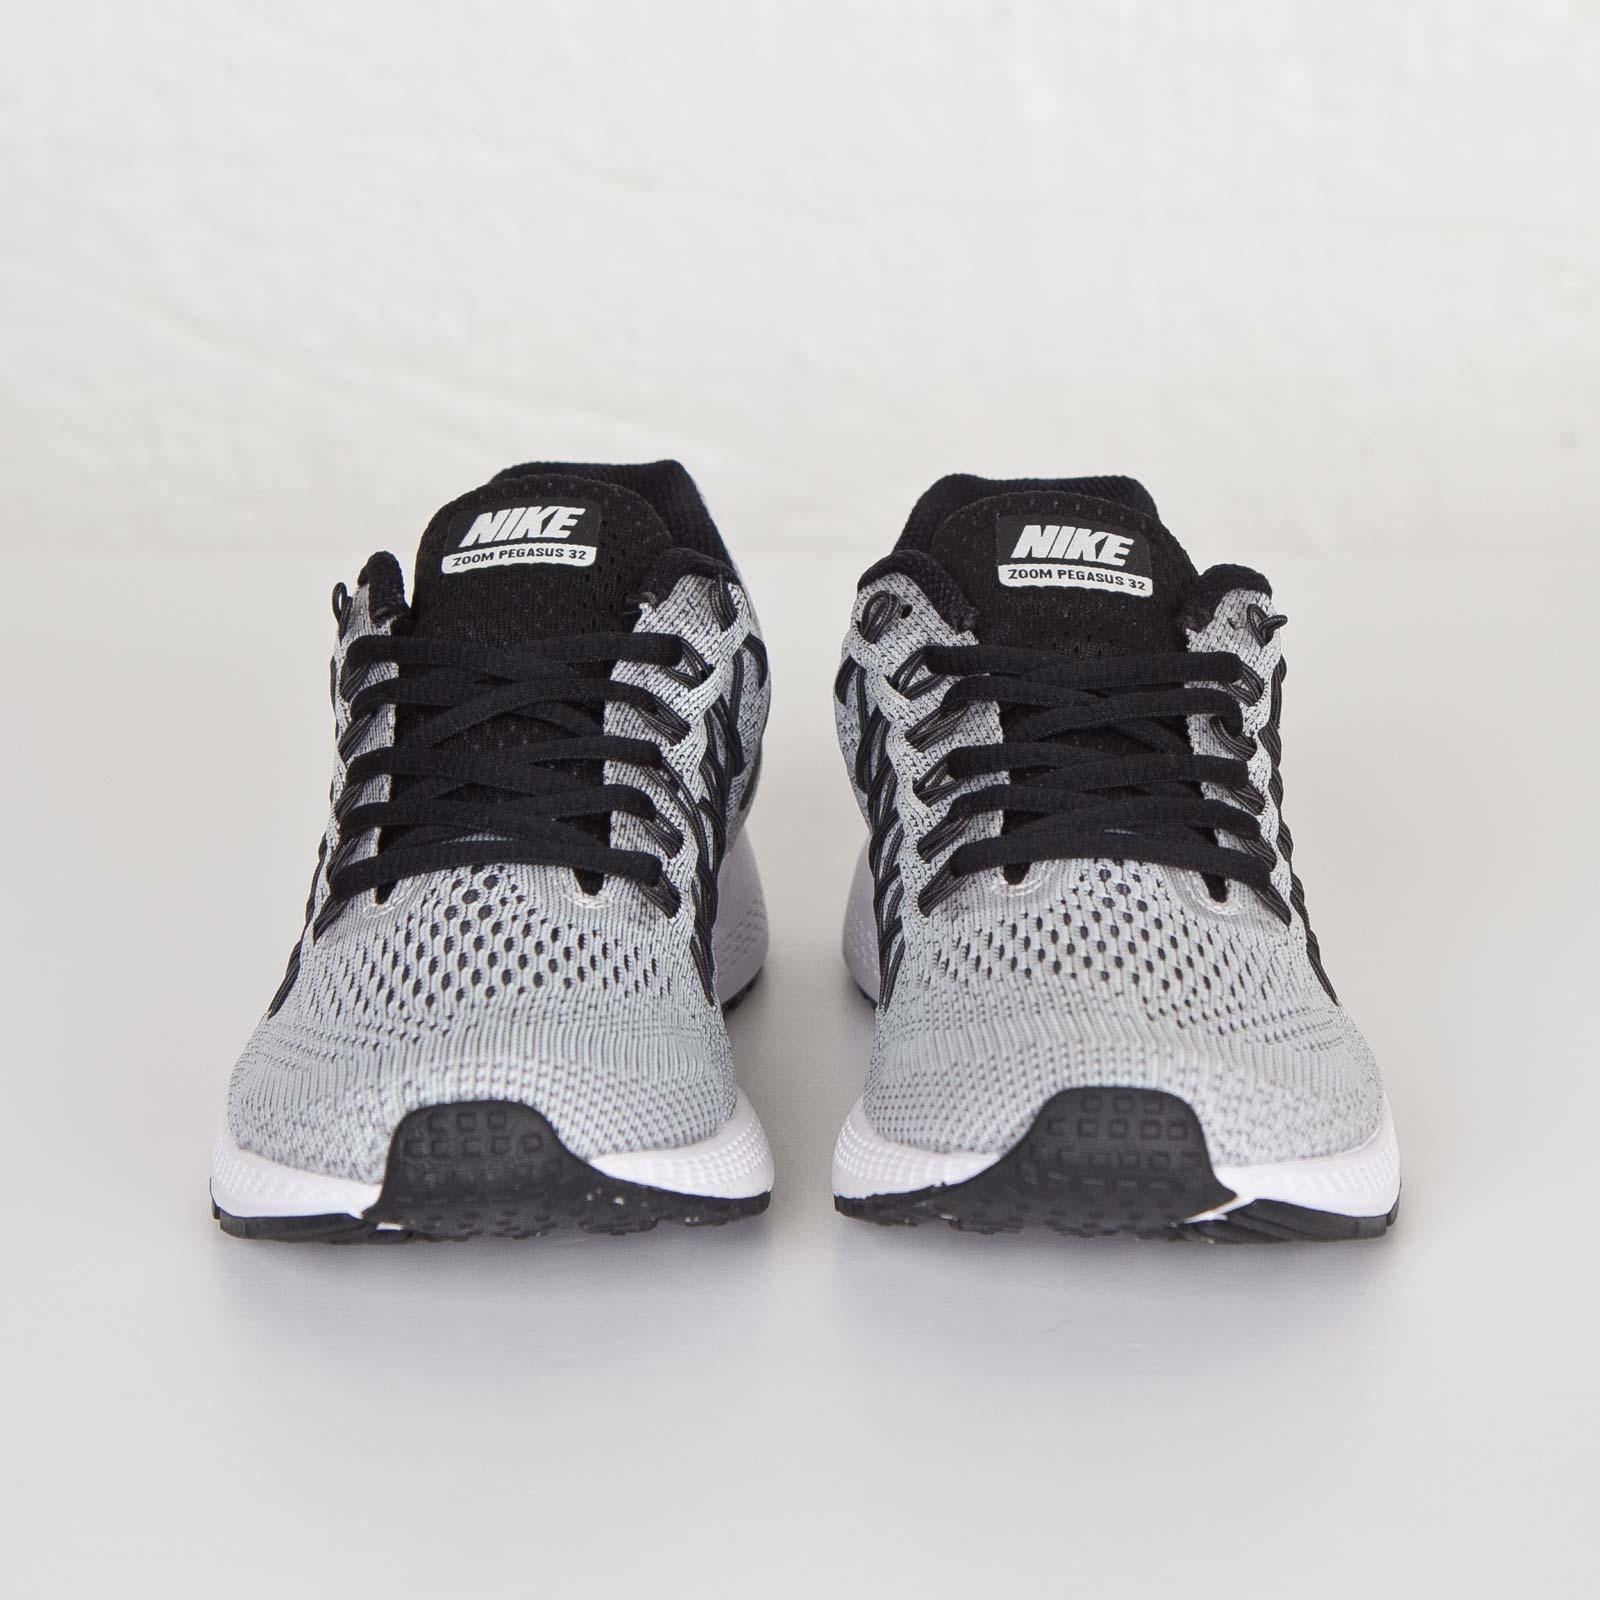 reputable site 3abed 4f901 Nike Wmns Air Zoom Pegasus 32 - 749344-002 - Sneakersnstuff ...